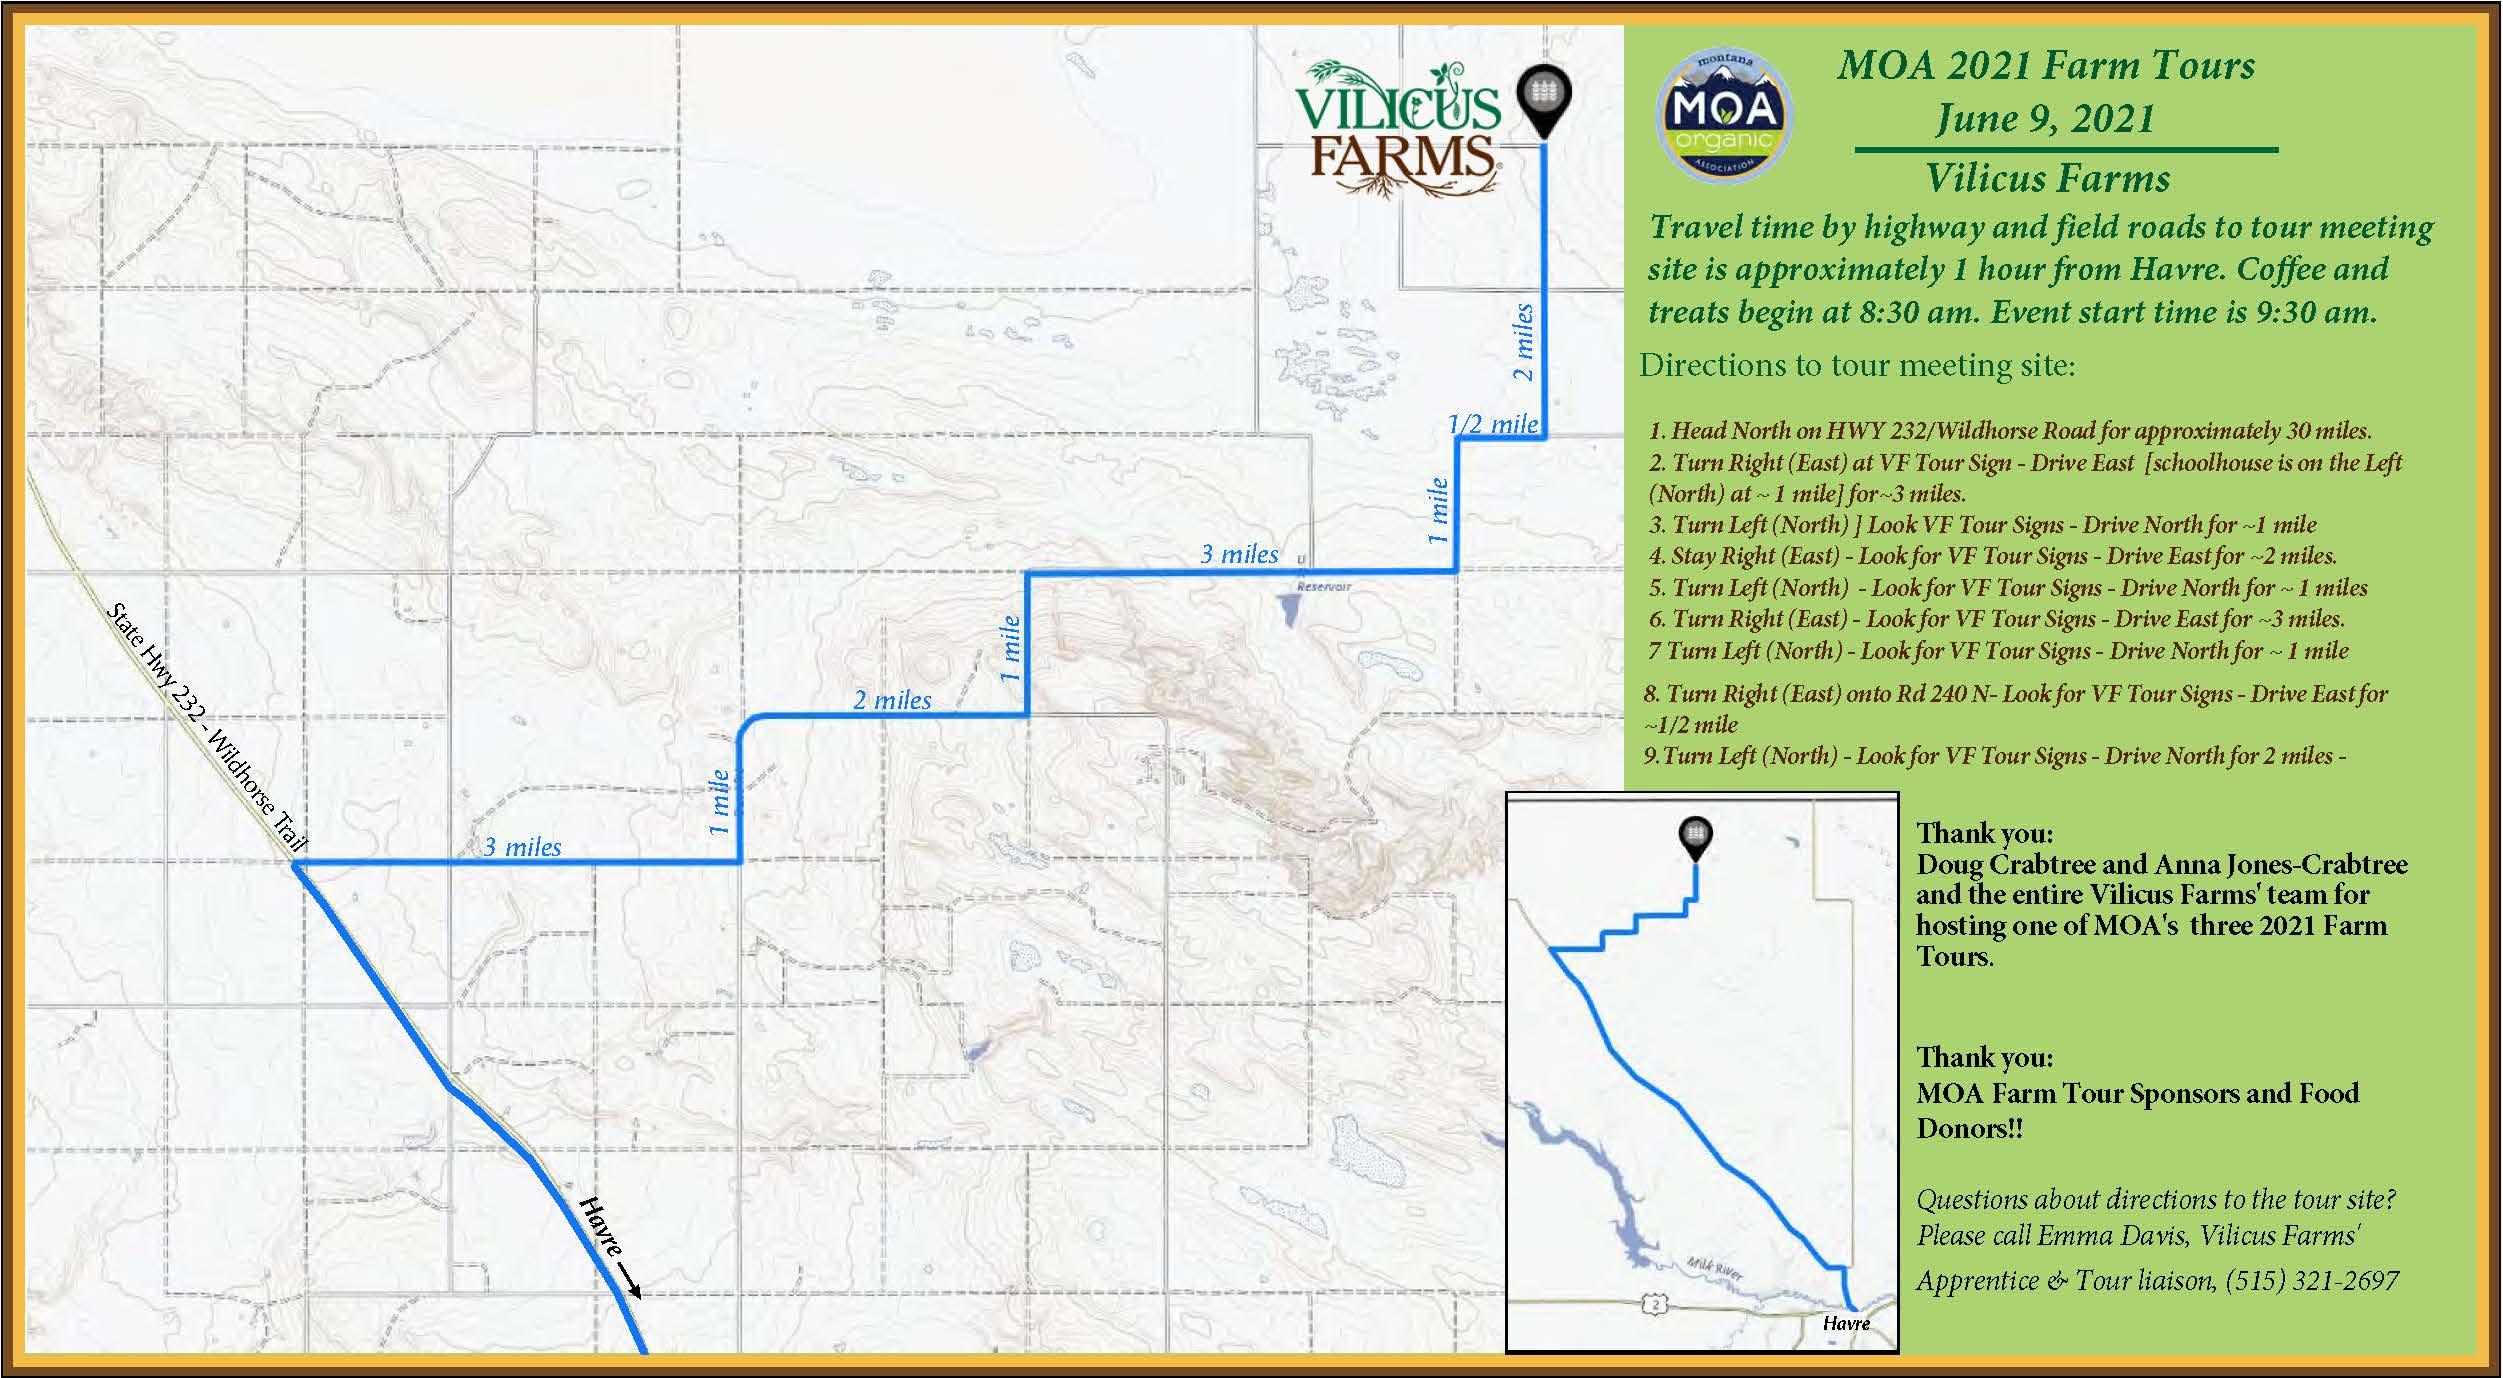 MOA 2021 FARM TOURS - VILICUS FARMS